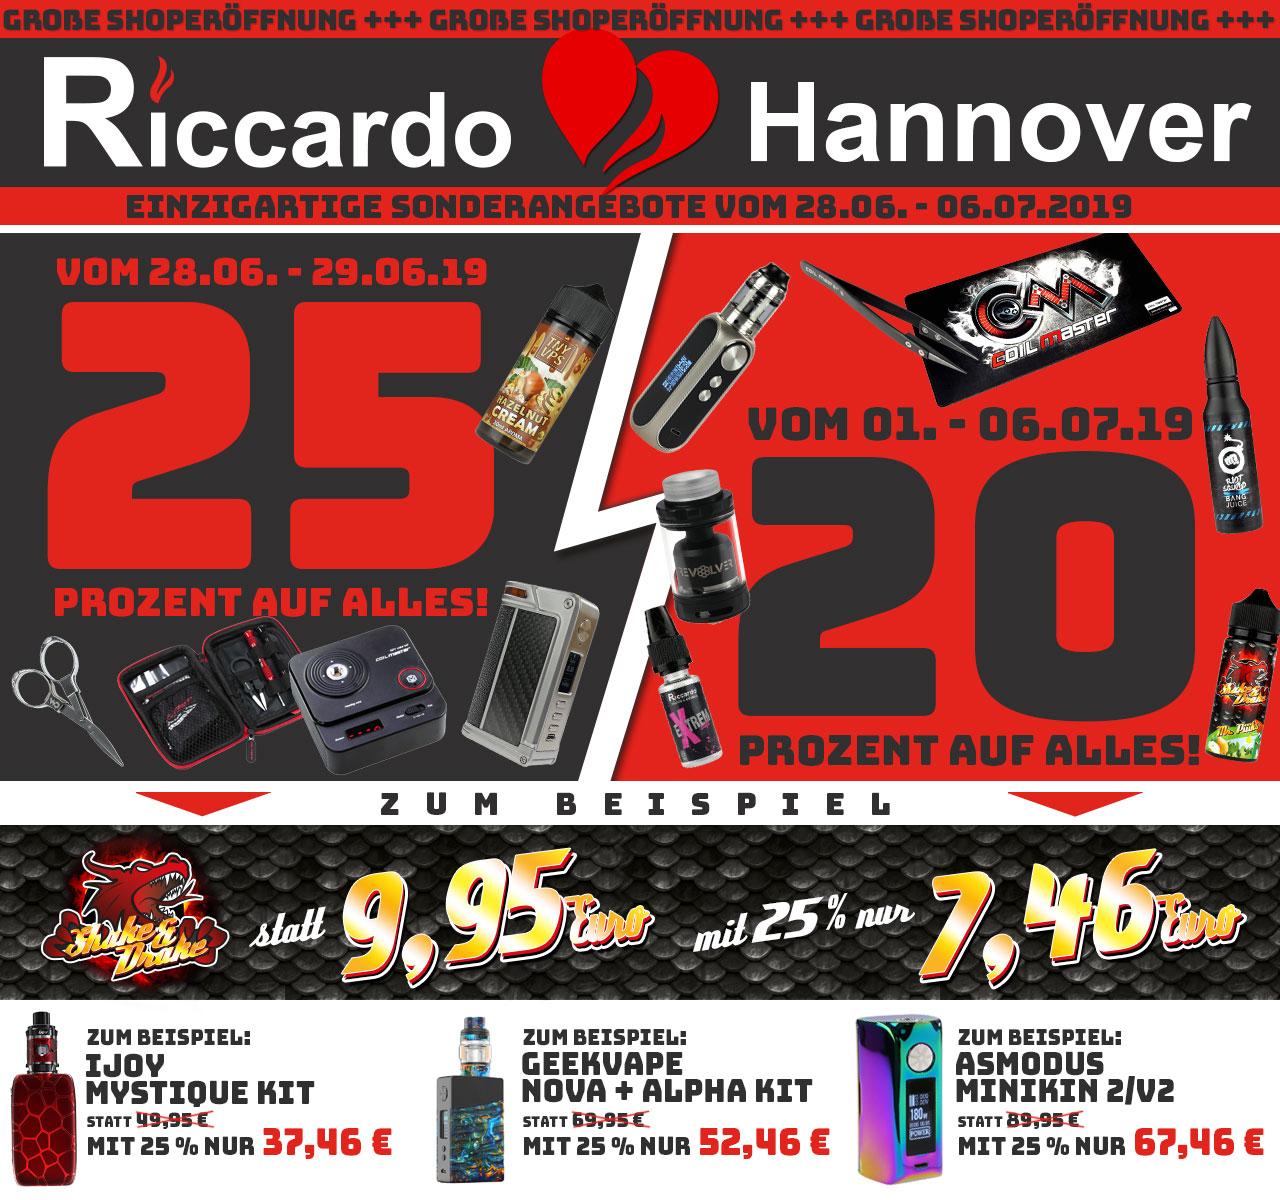 [Riccardo]: ONLINE: 15% Rabatt auf alles – OFFLINE Hannover: 25% Rabatt auf alles